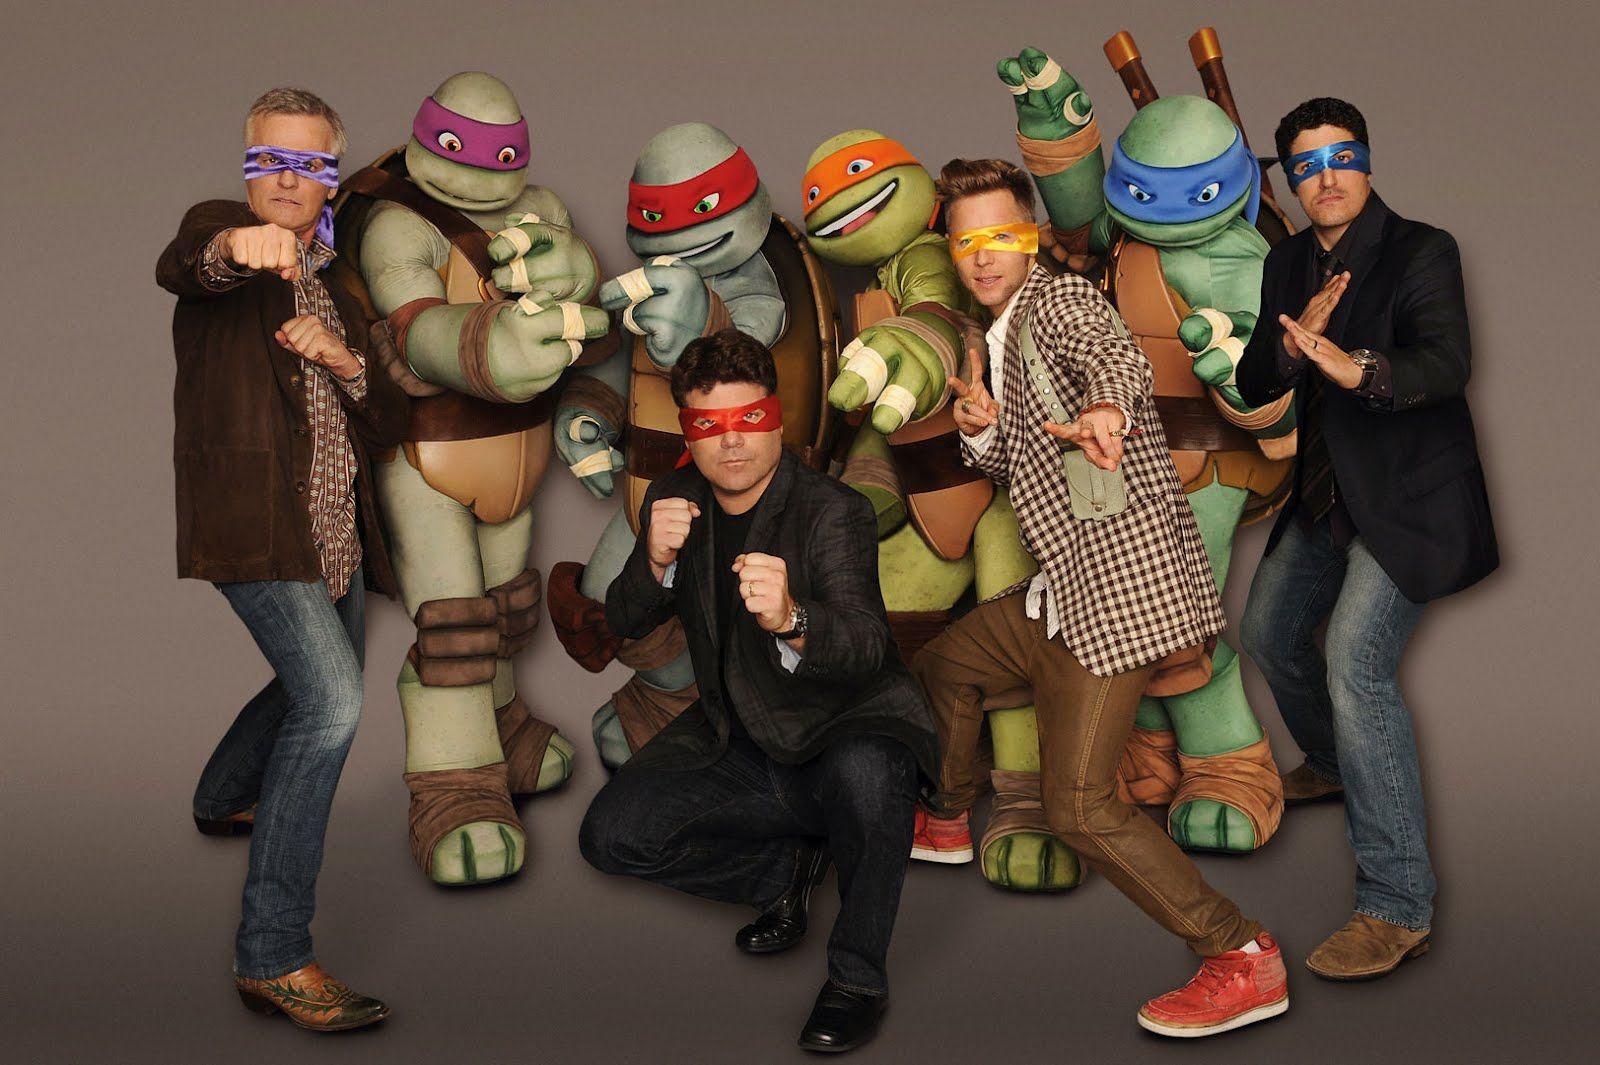 Tmnt Nickeloden Michealangelo Nickelodeon Cast Of Teenage Mutant Ninja Turtles Leonardo Donatello Tmnt Teenage Mutant Ninja Ninja Turtles